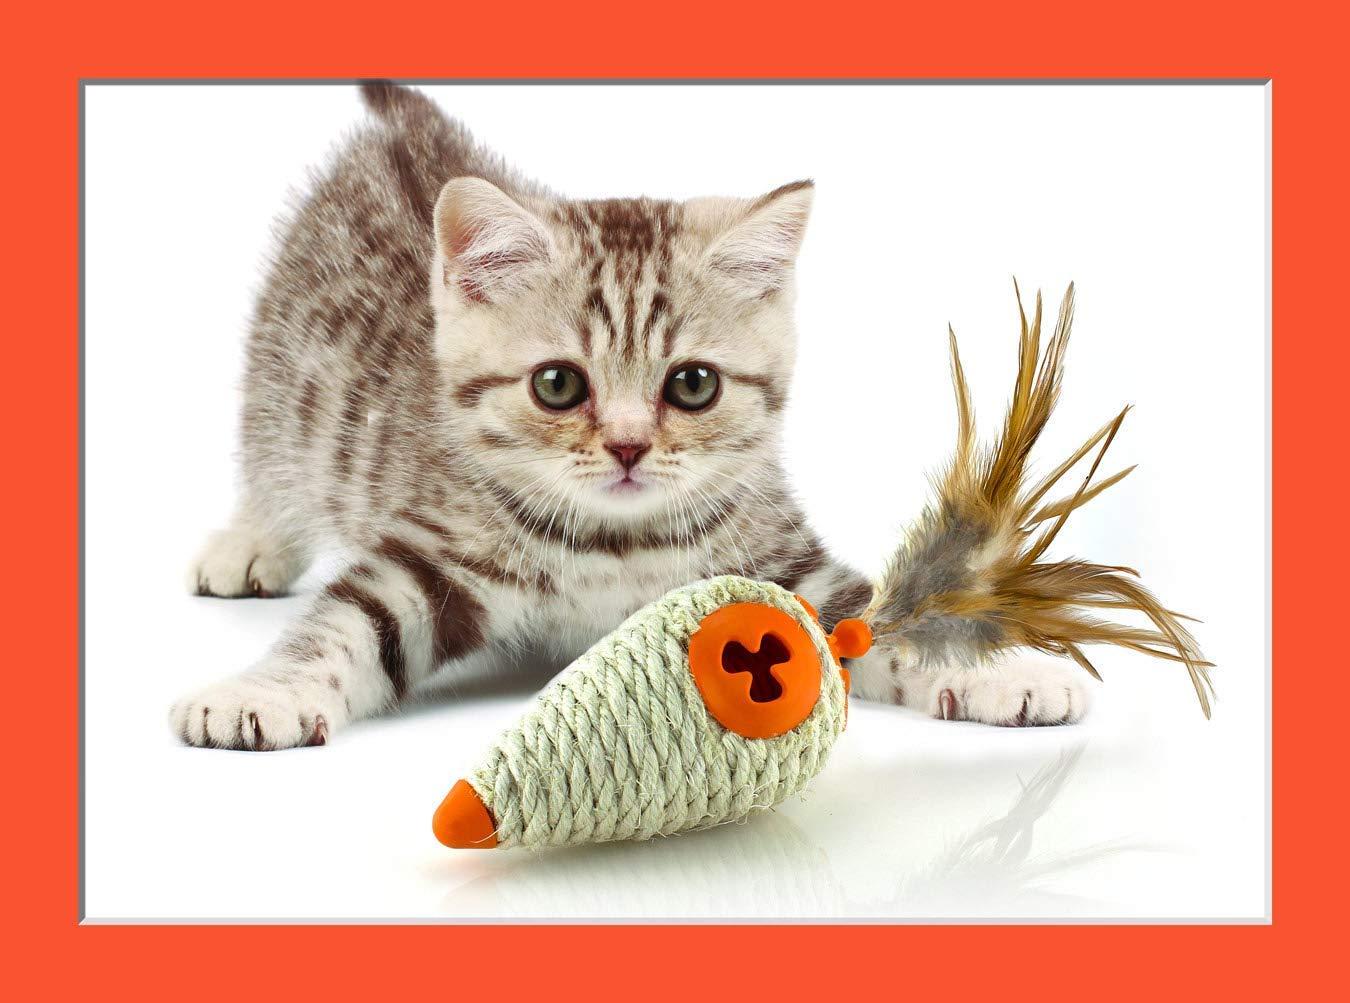 Cute Playful Kitten Staring (Copy)